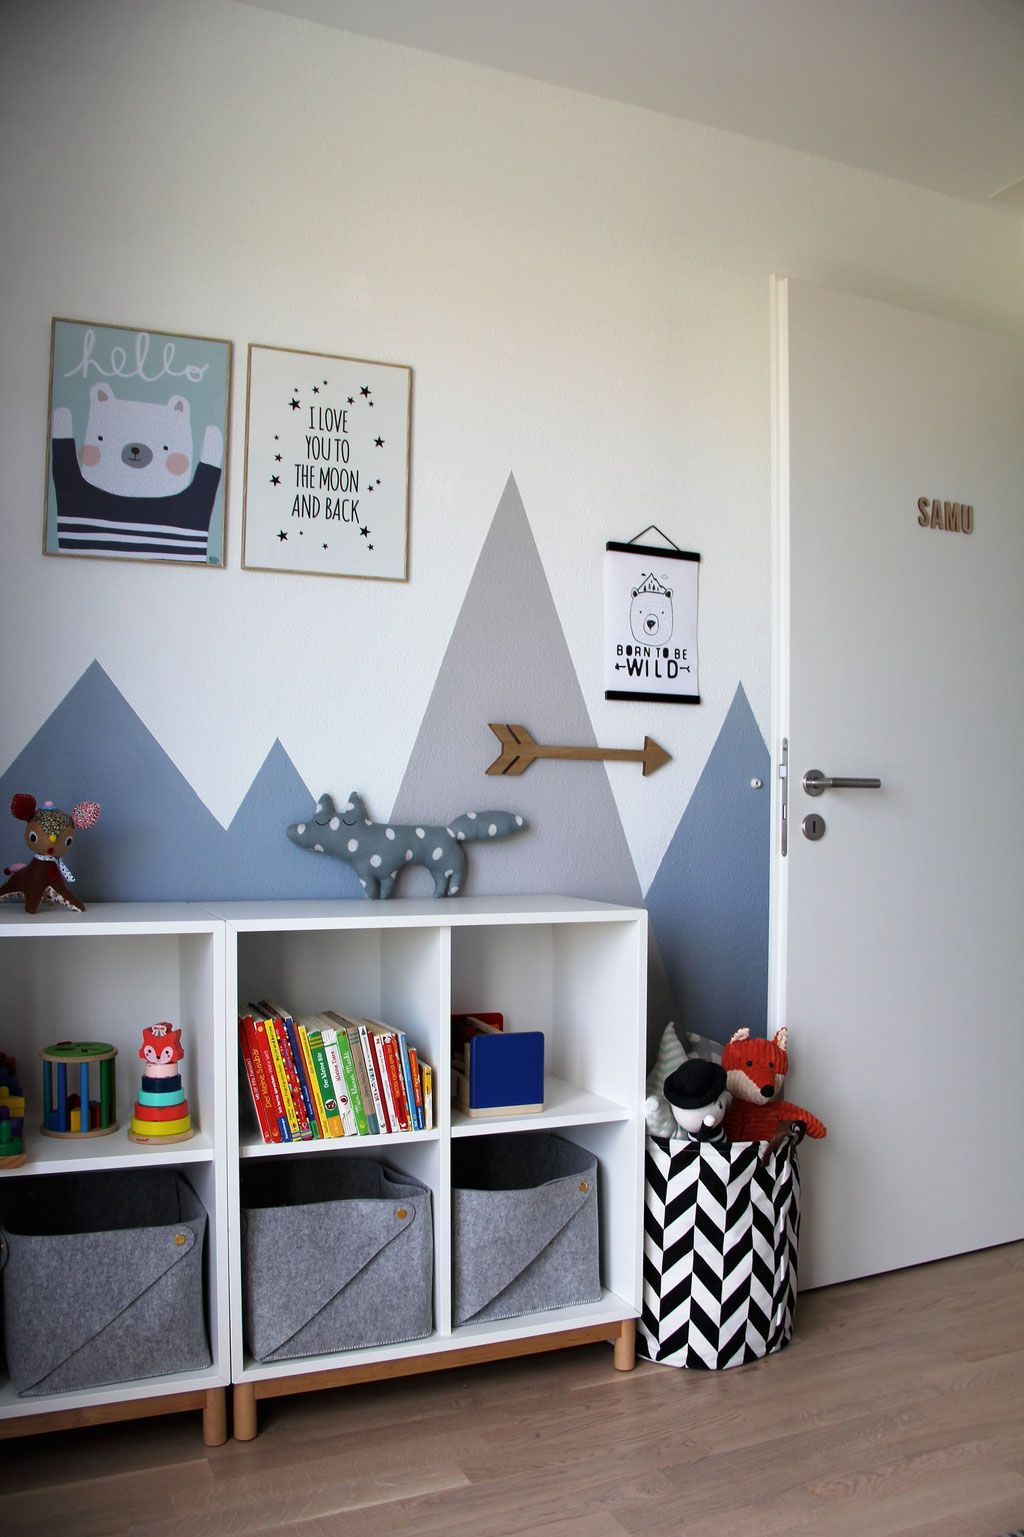 Babyzimmer Mint Grau Best Of Fotografie Kinderzimmer Inspiration nordic Berge Blau Grau Mint #toddlerrooms